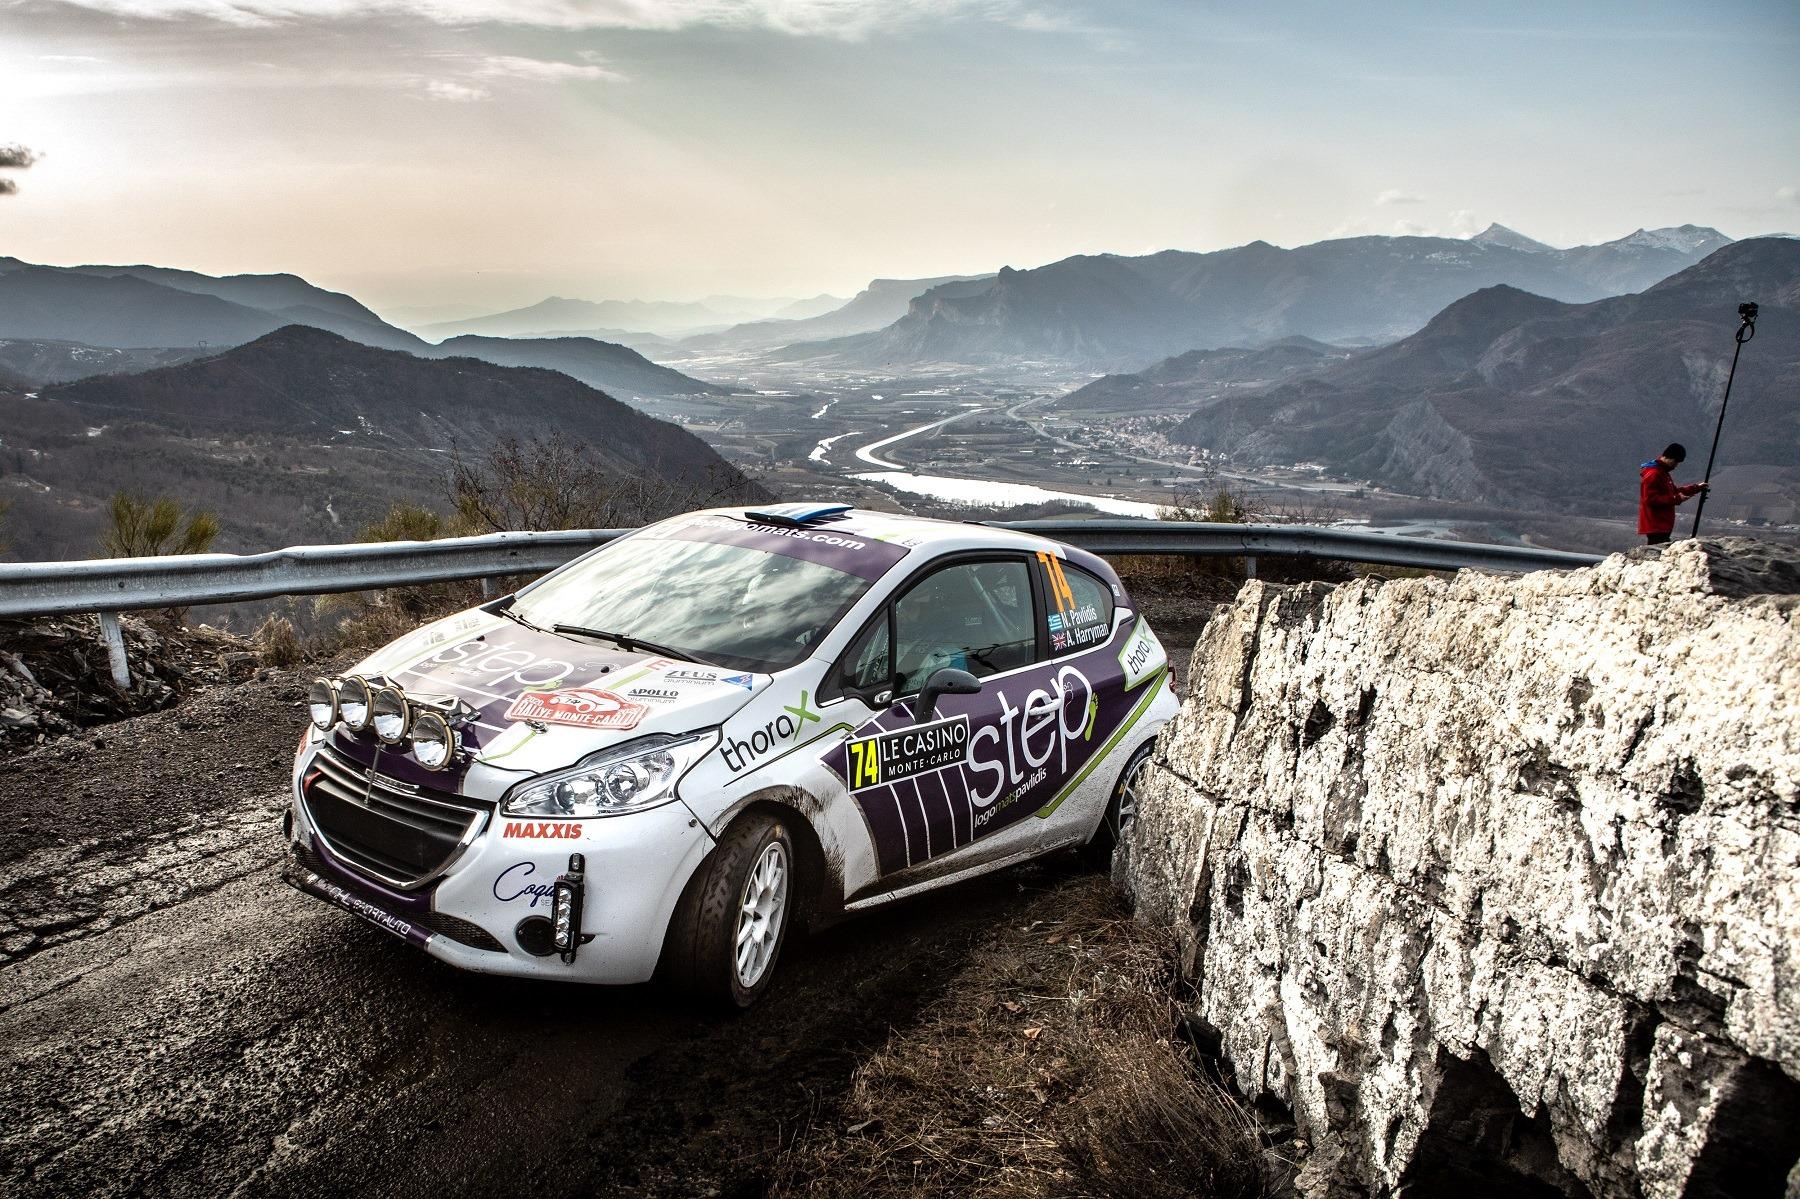 Step Racing - Rallye Monte Carlo - Day 2: Πίεσε και κέρδισε θέσεις ο Νίκος Παυλίδης την Παρασκευή!